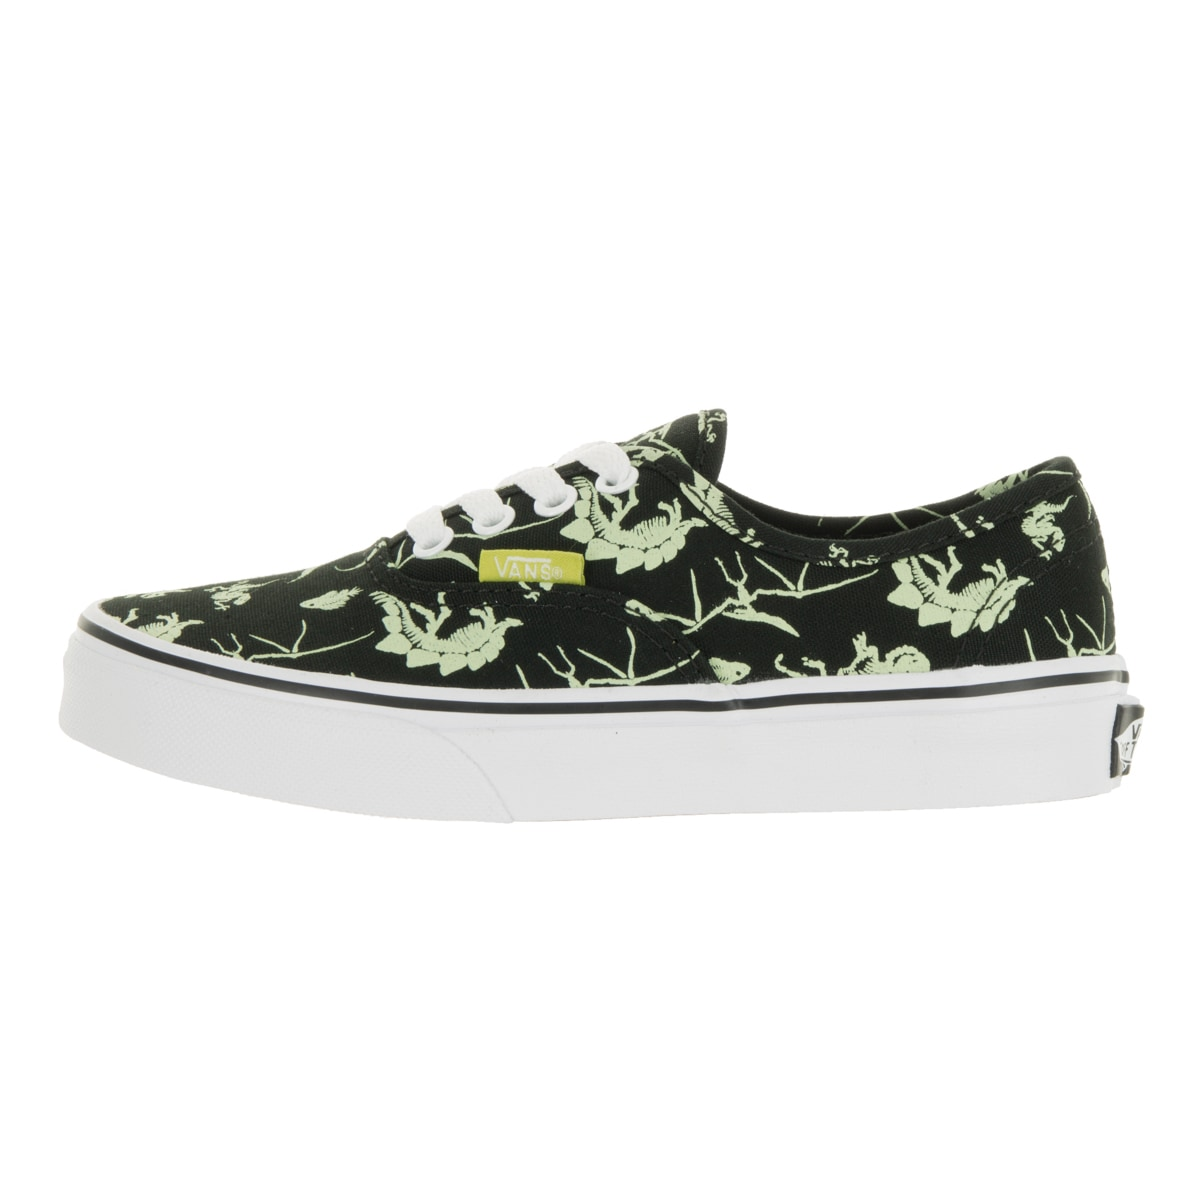 vans dinosaur shoes